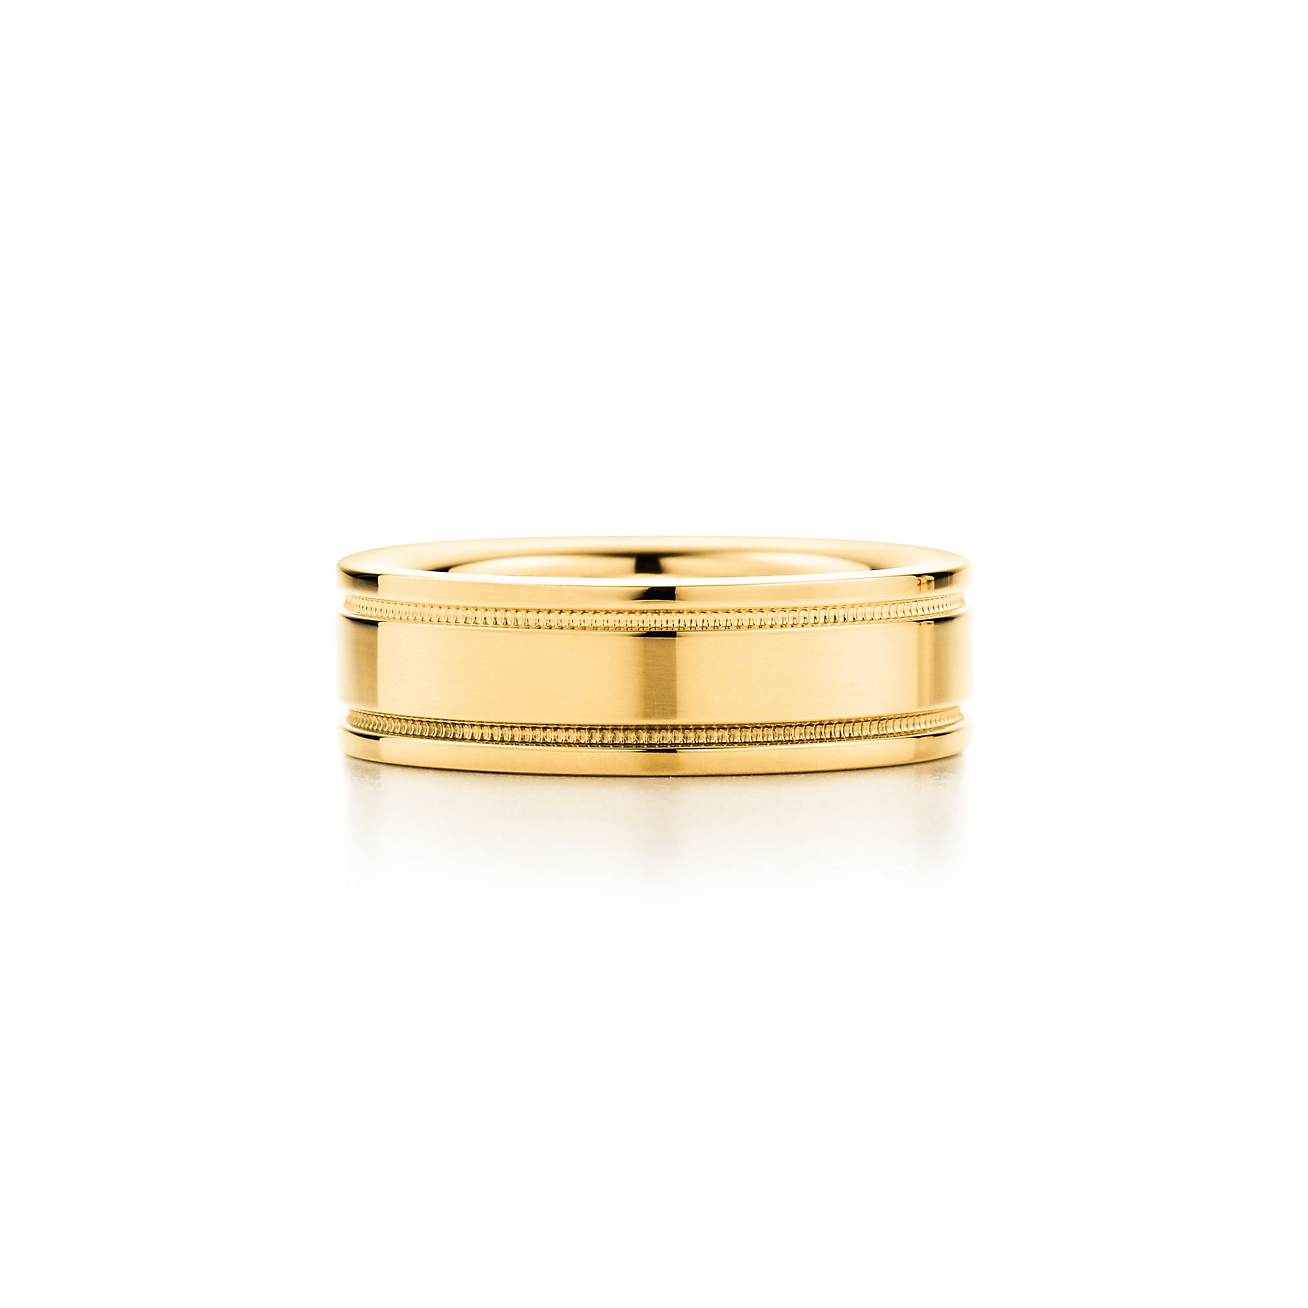 Tiffany flat double milgrain wedding band ring in 18k gold 6 mm deletelarge tiffany flat doublebrmilgrain weddingbrband junglespirit Image collections